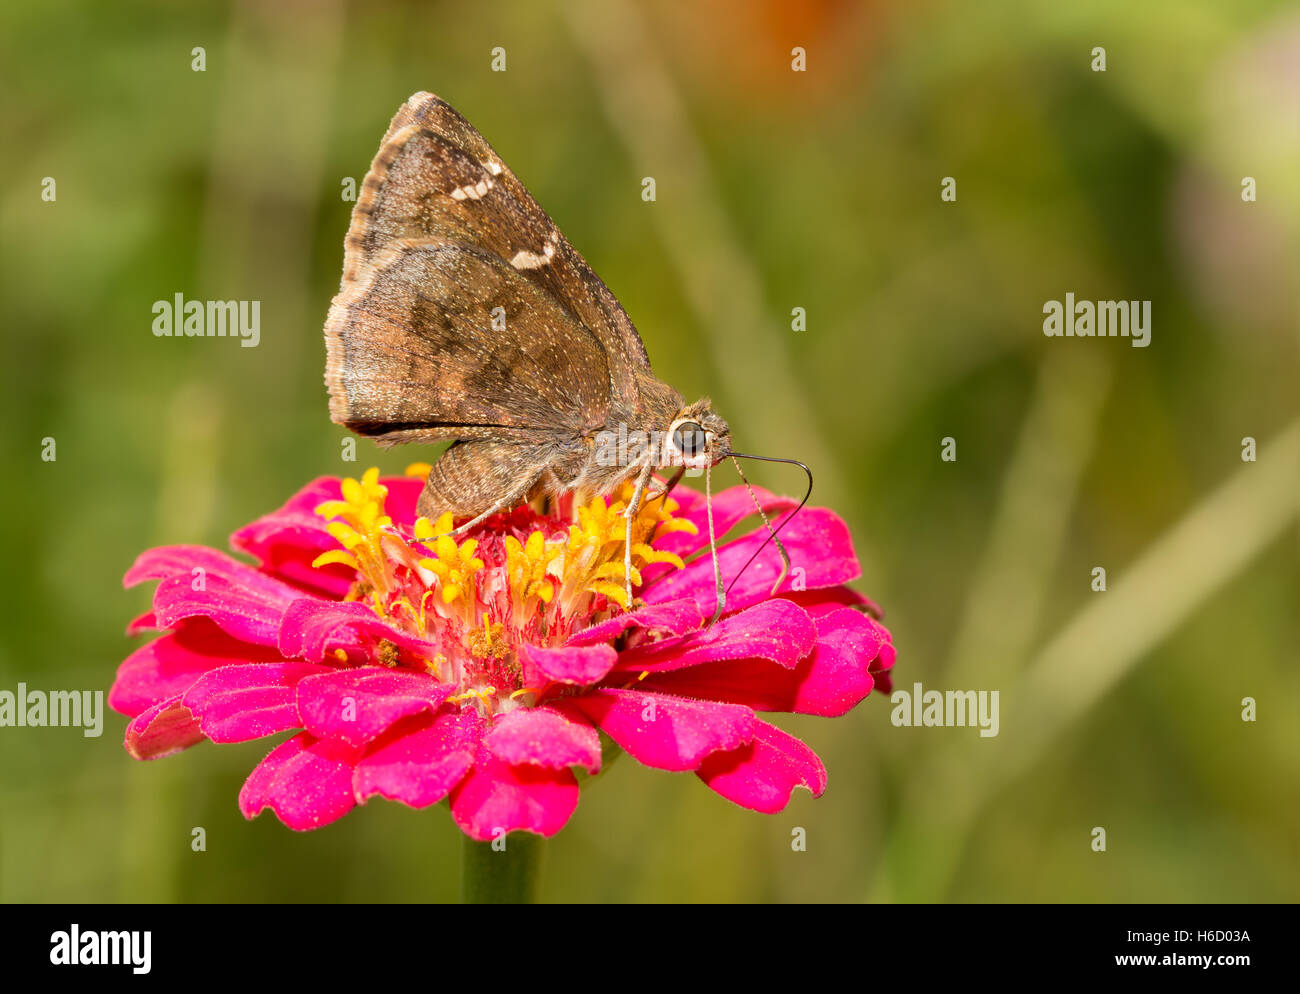 Sur alimentándose de una mariposa Cloudywing Zinnia flor rosa Foto de stock